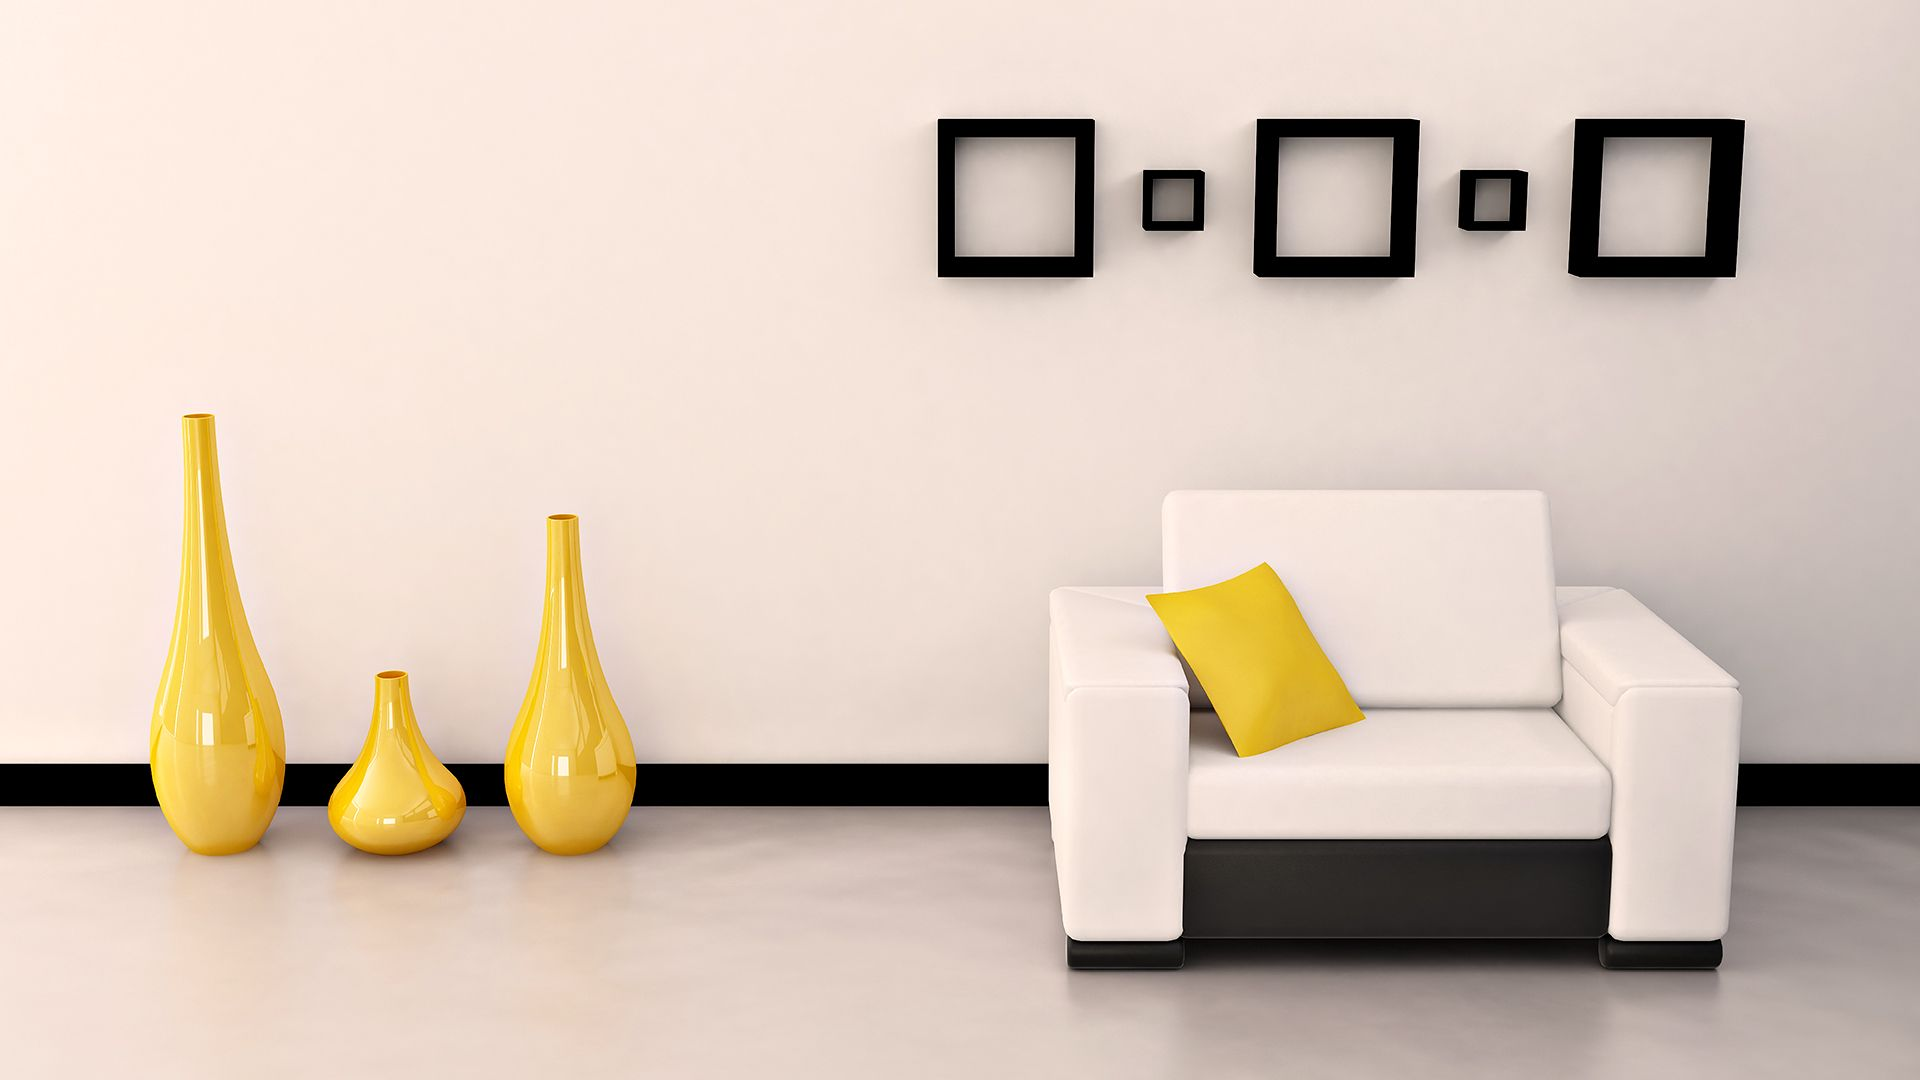 Check Out This Really Cool Home Interior Living Room Livingroomdesign Livingroomideas Livingroom Homedecor Home Wallpaper Elegant Home Decor House Interior